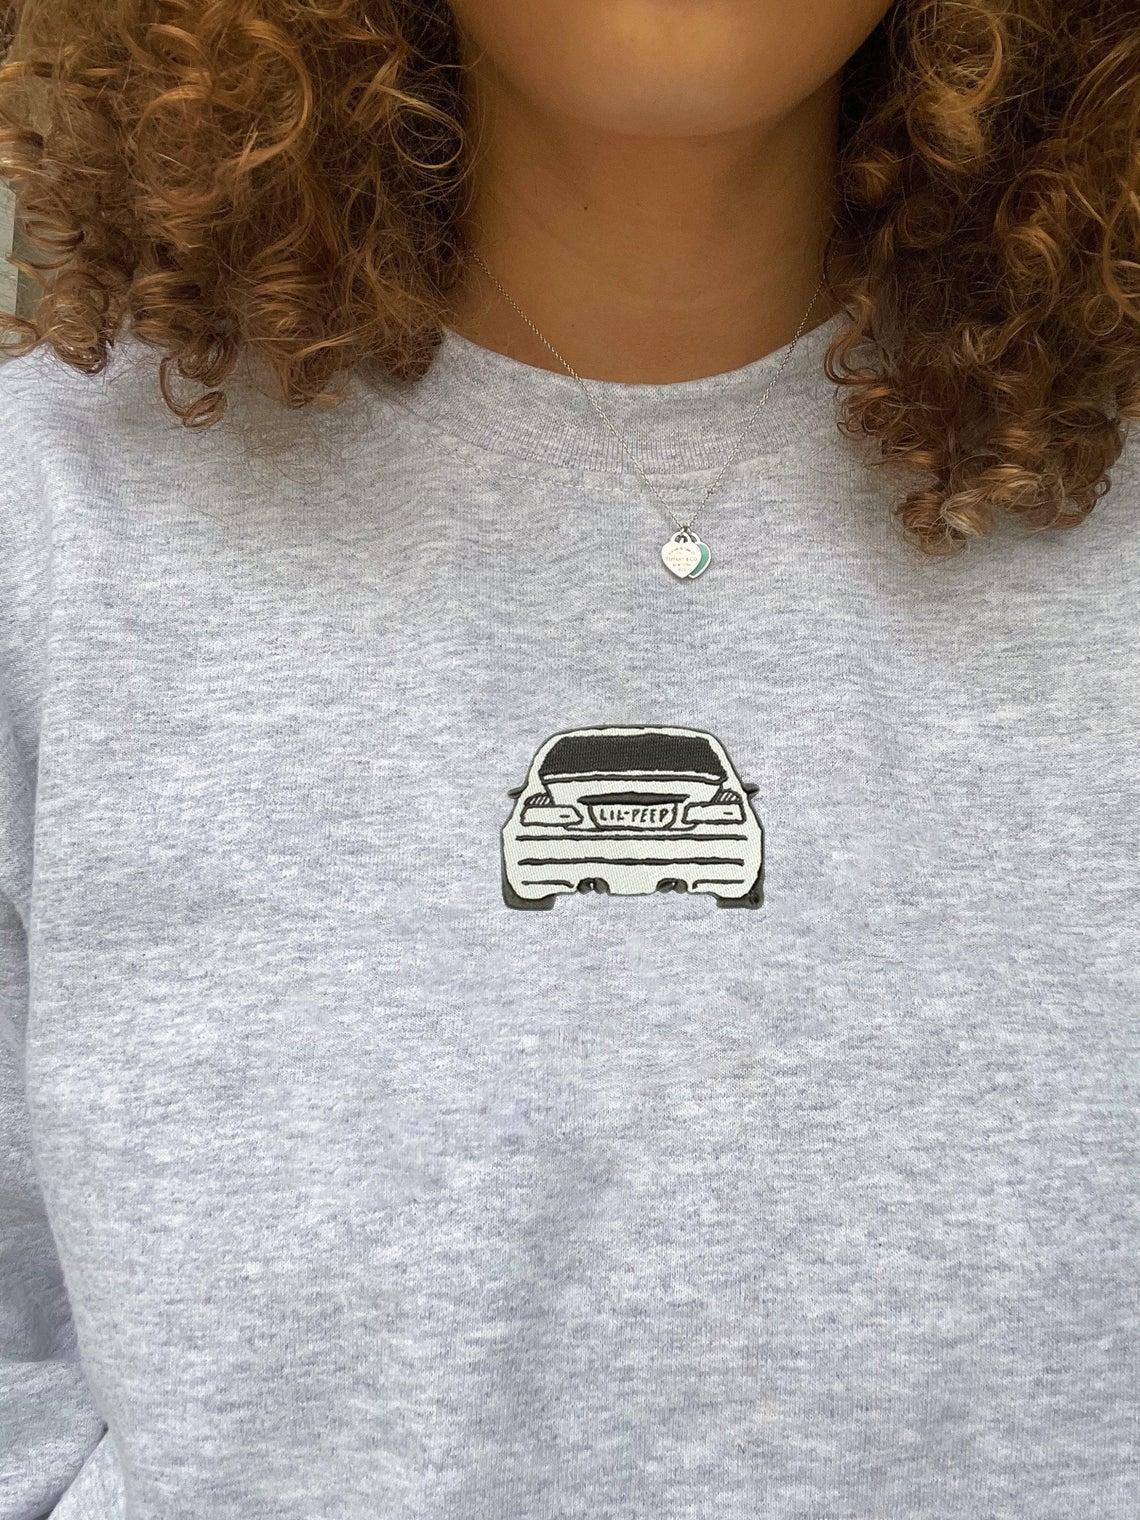 Lil Peep Beamer Boy Car Embroidered Swoosh Sweatshirt/t-shirt/hoodie Embroidery